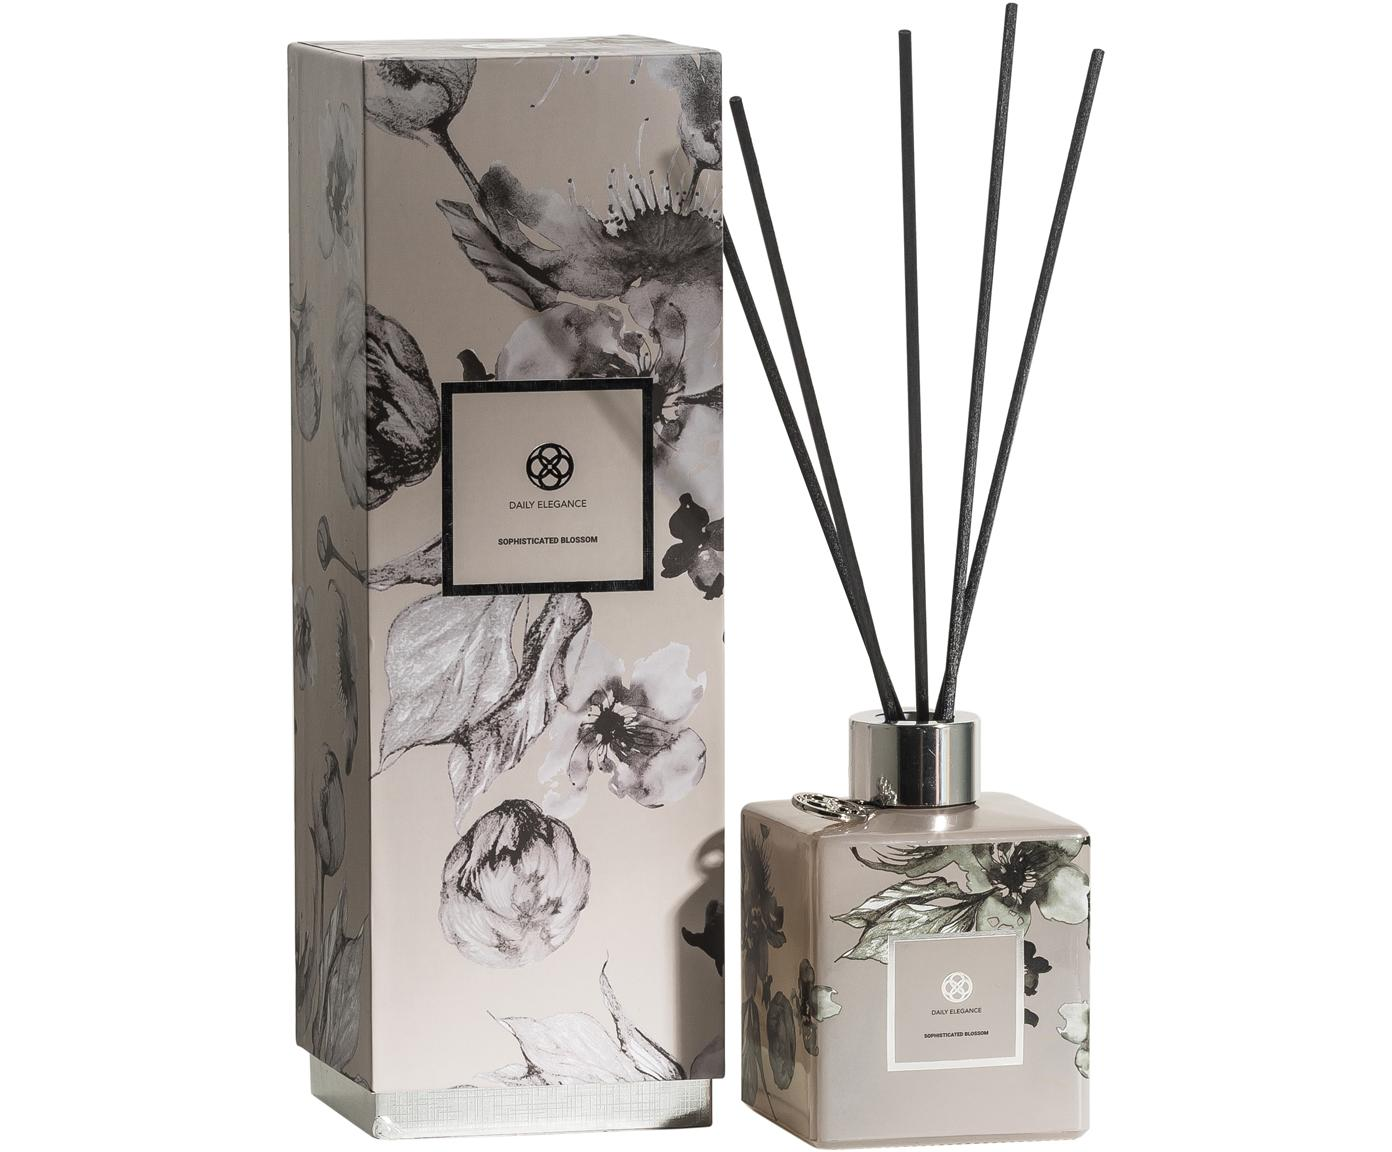 Diffusore Dawon, Contenitore: vetro, Beige, grigio, nero, Larg. 9 x Alt. 24 cm